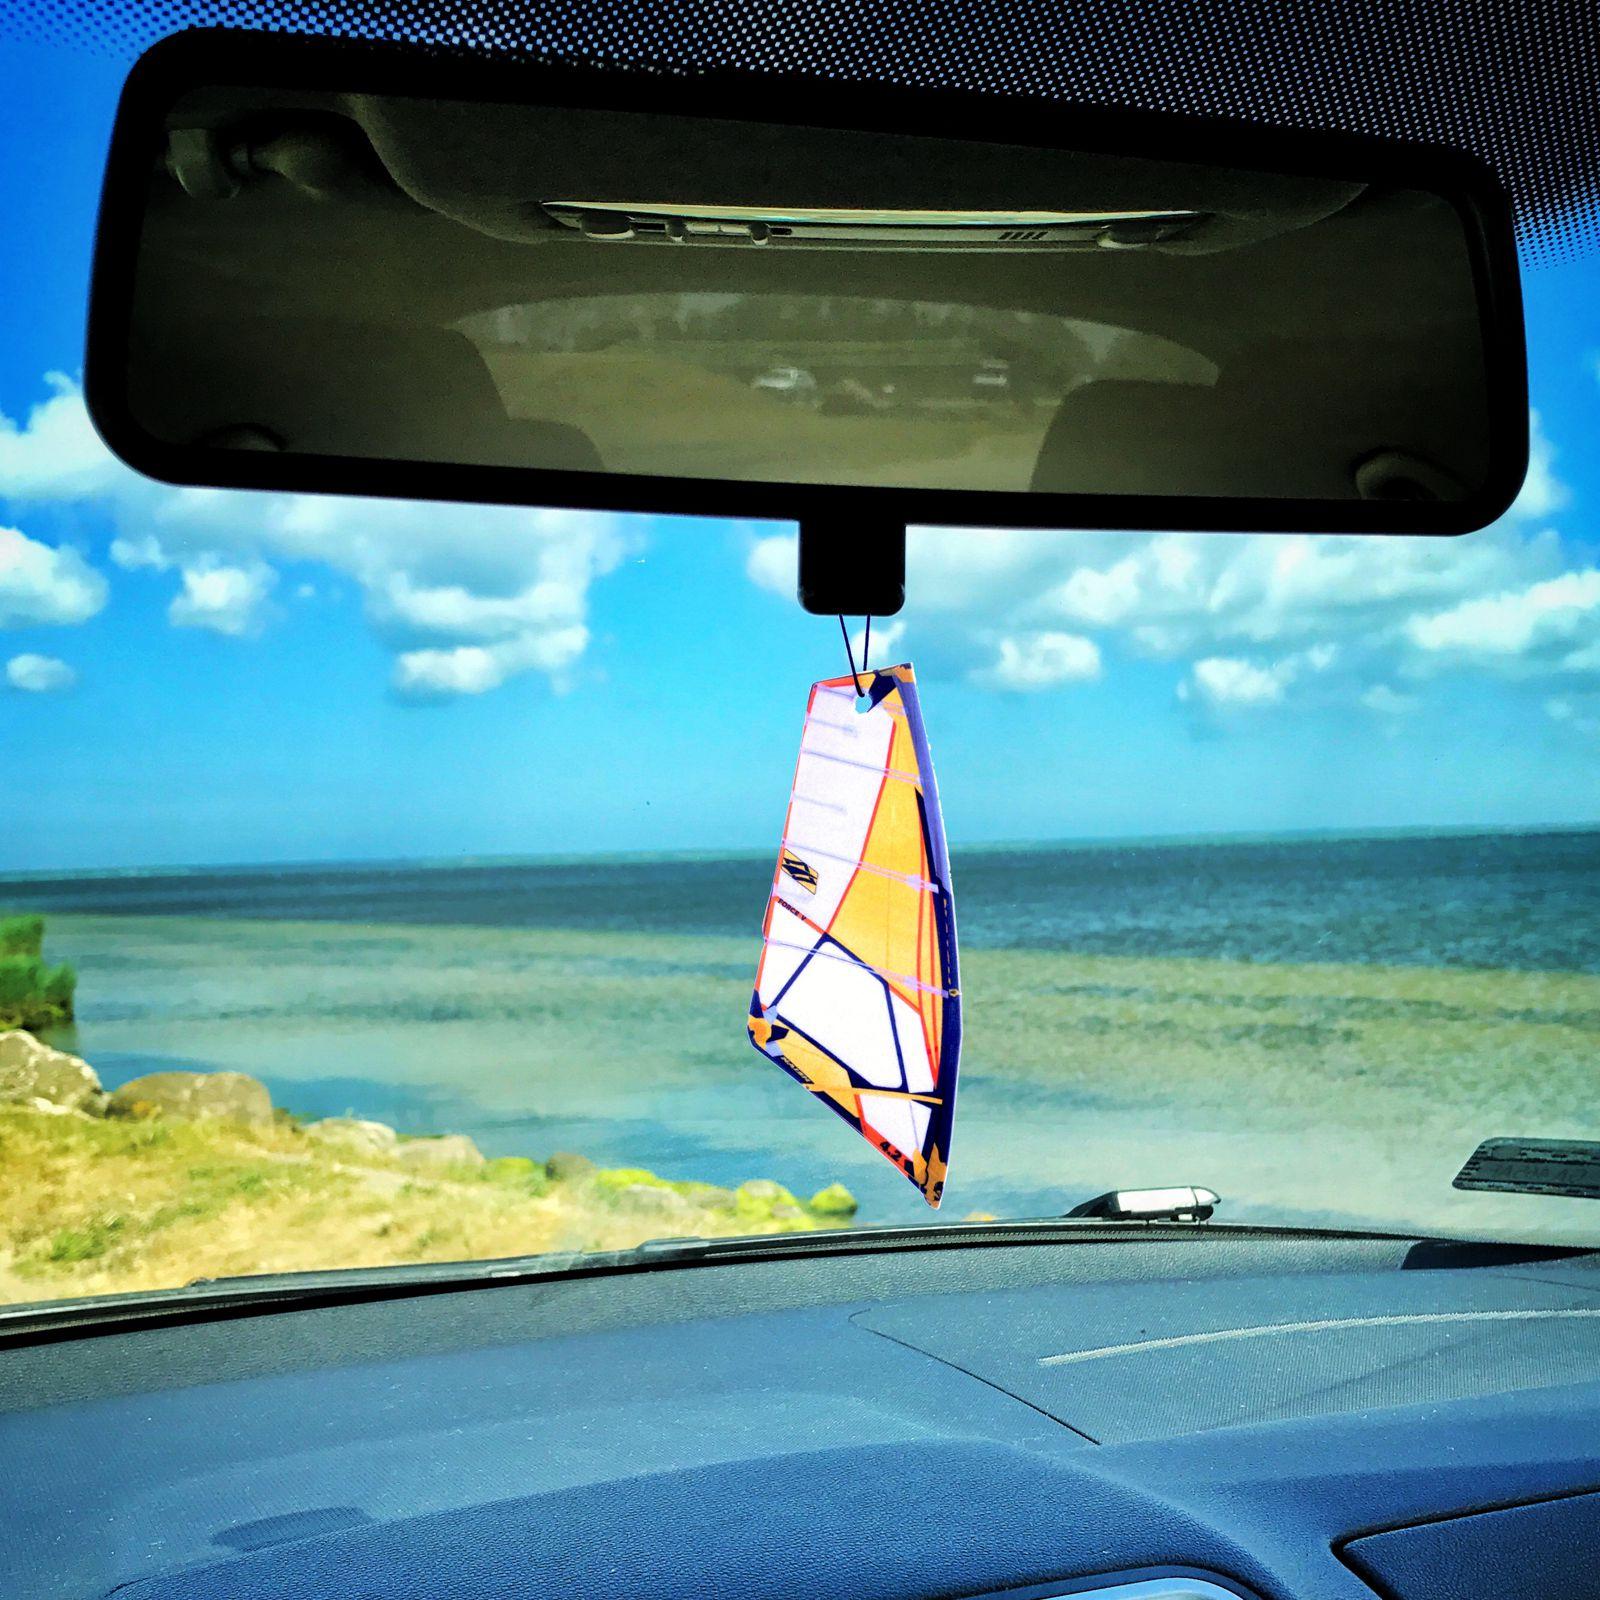 ATAN Mistral Neopren Latex Schuh 3mm Gr 44-45 T4 Neo Boot Surf Kite Windsurf